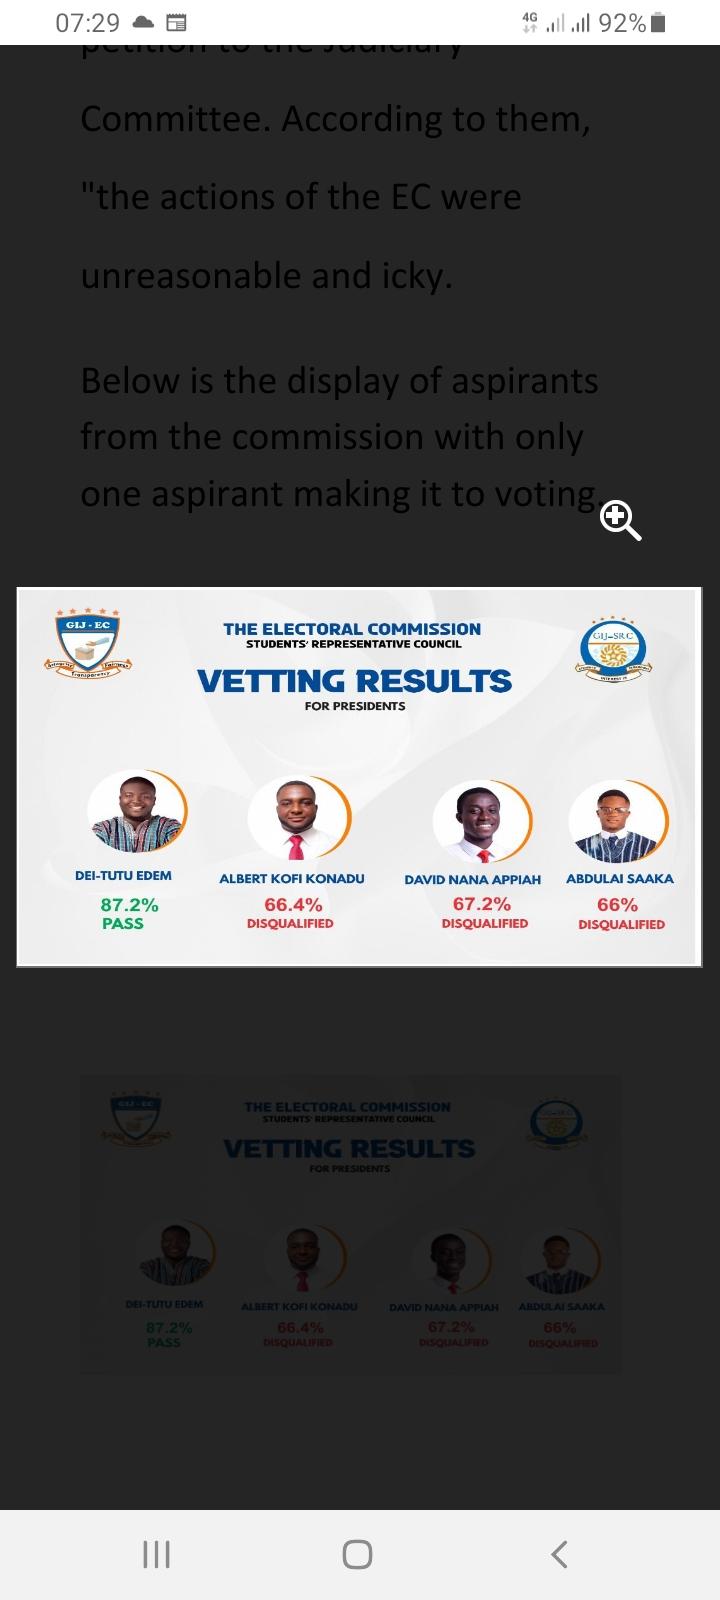 GIJ Disqualifies 3 SRC Presidential Aspirants